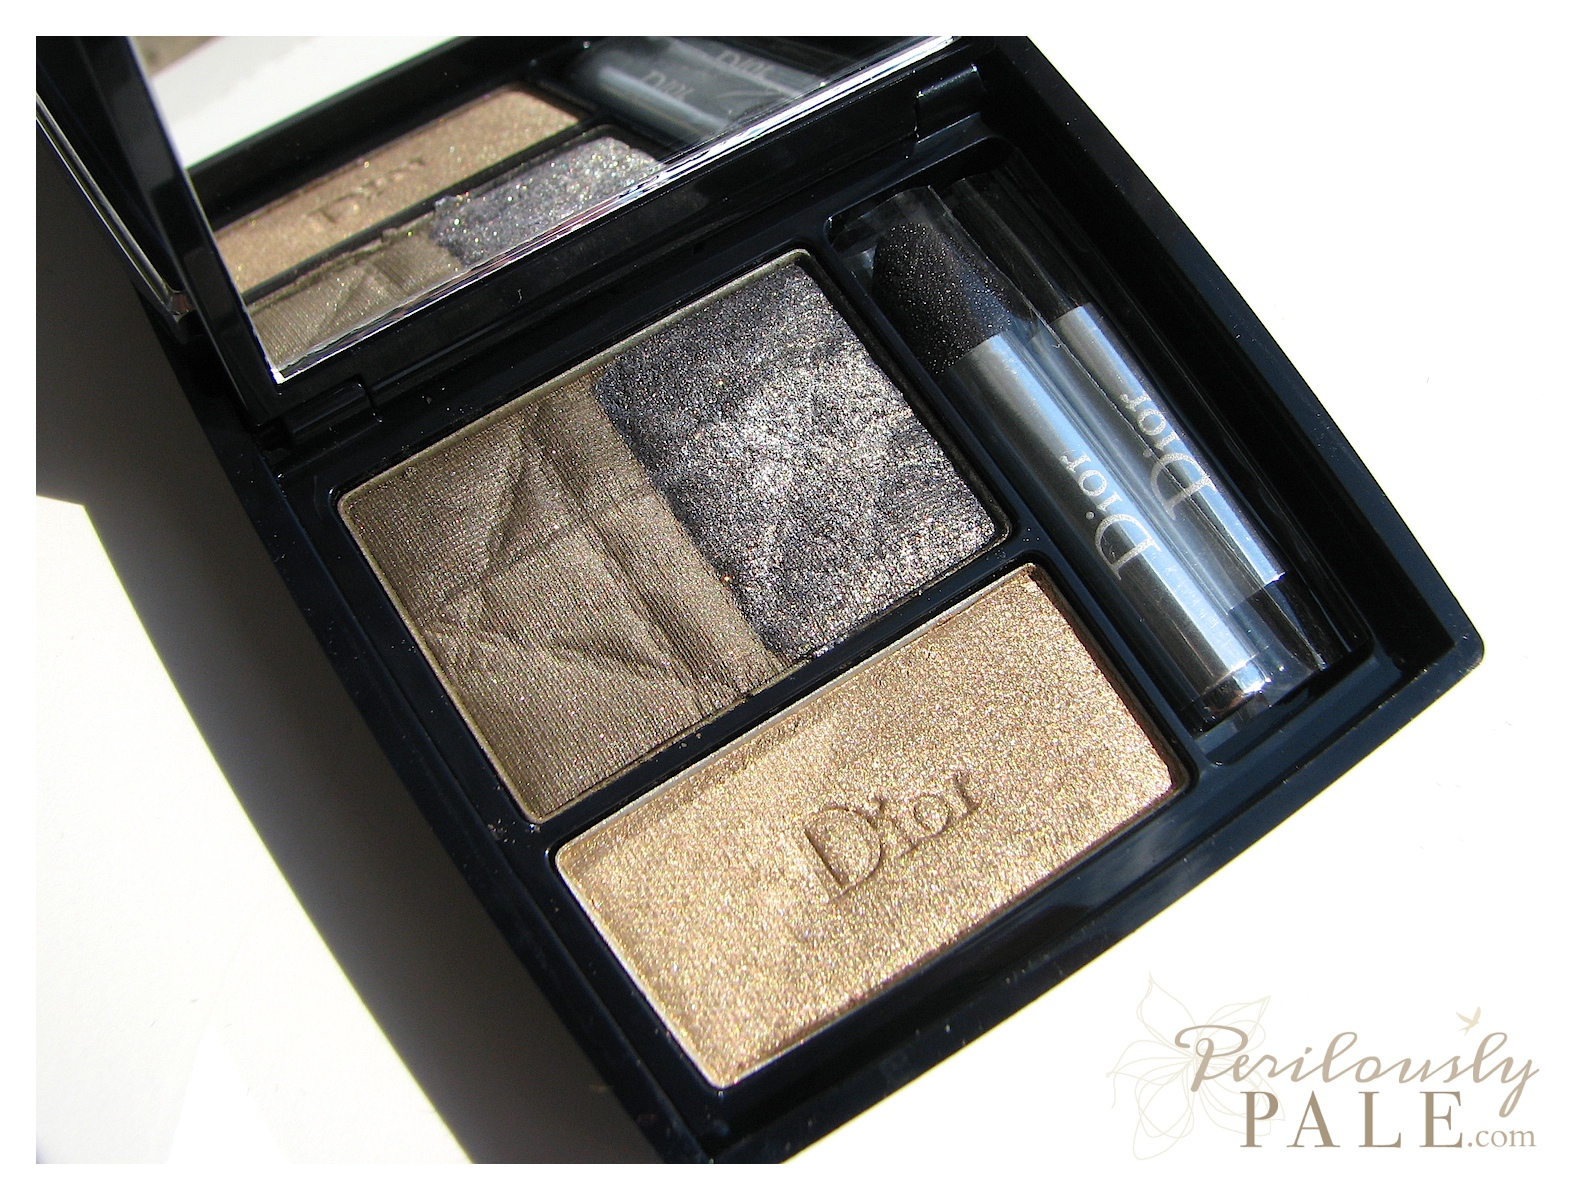 Dior 3 Couleurs Smoky Palette In 481 Smoky Khaki Photos